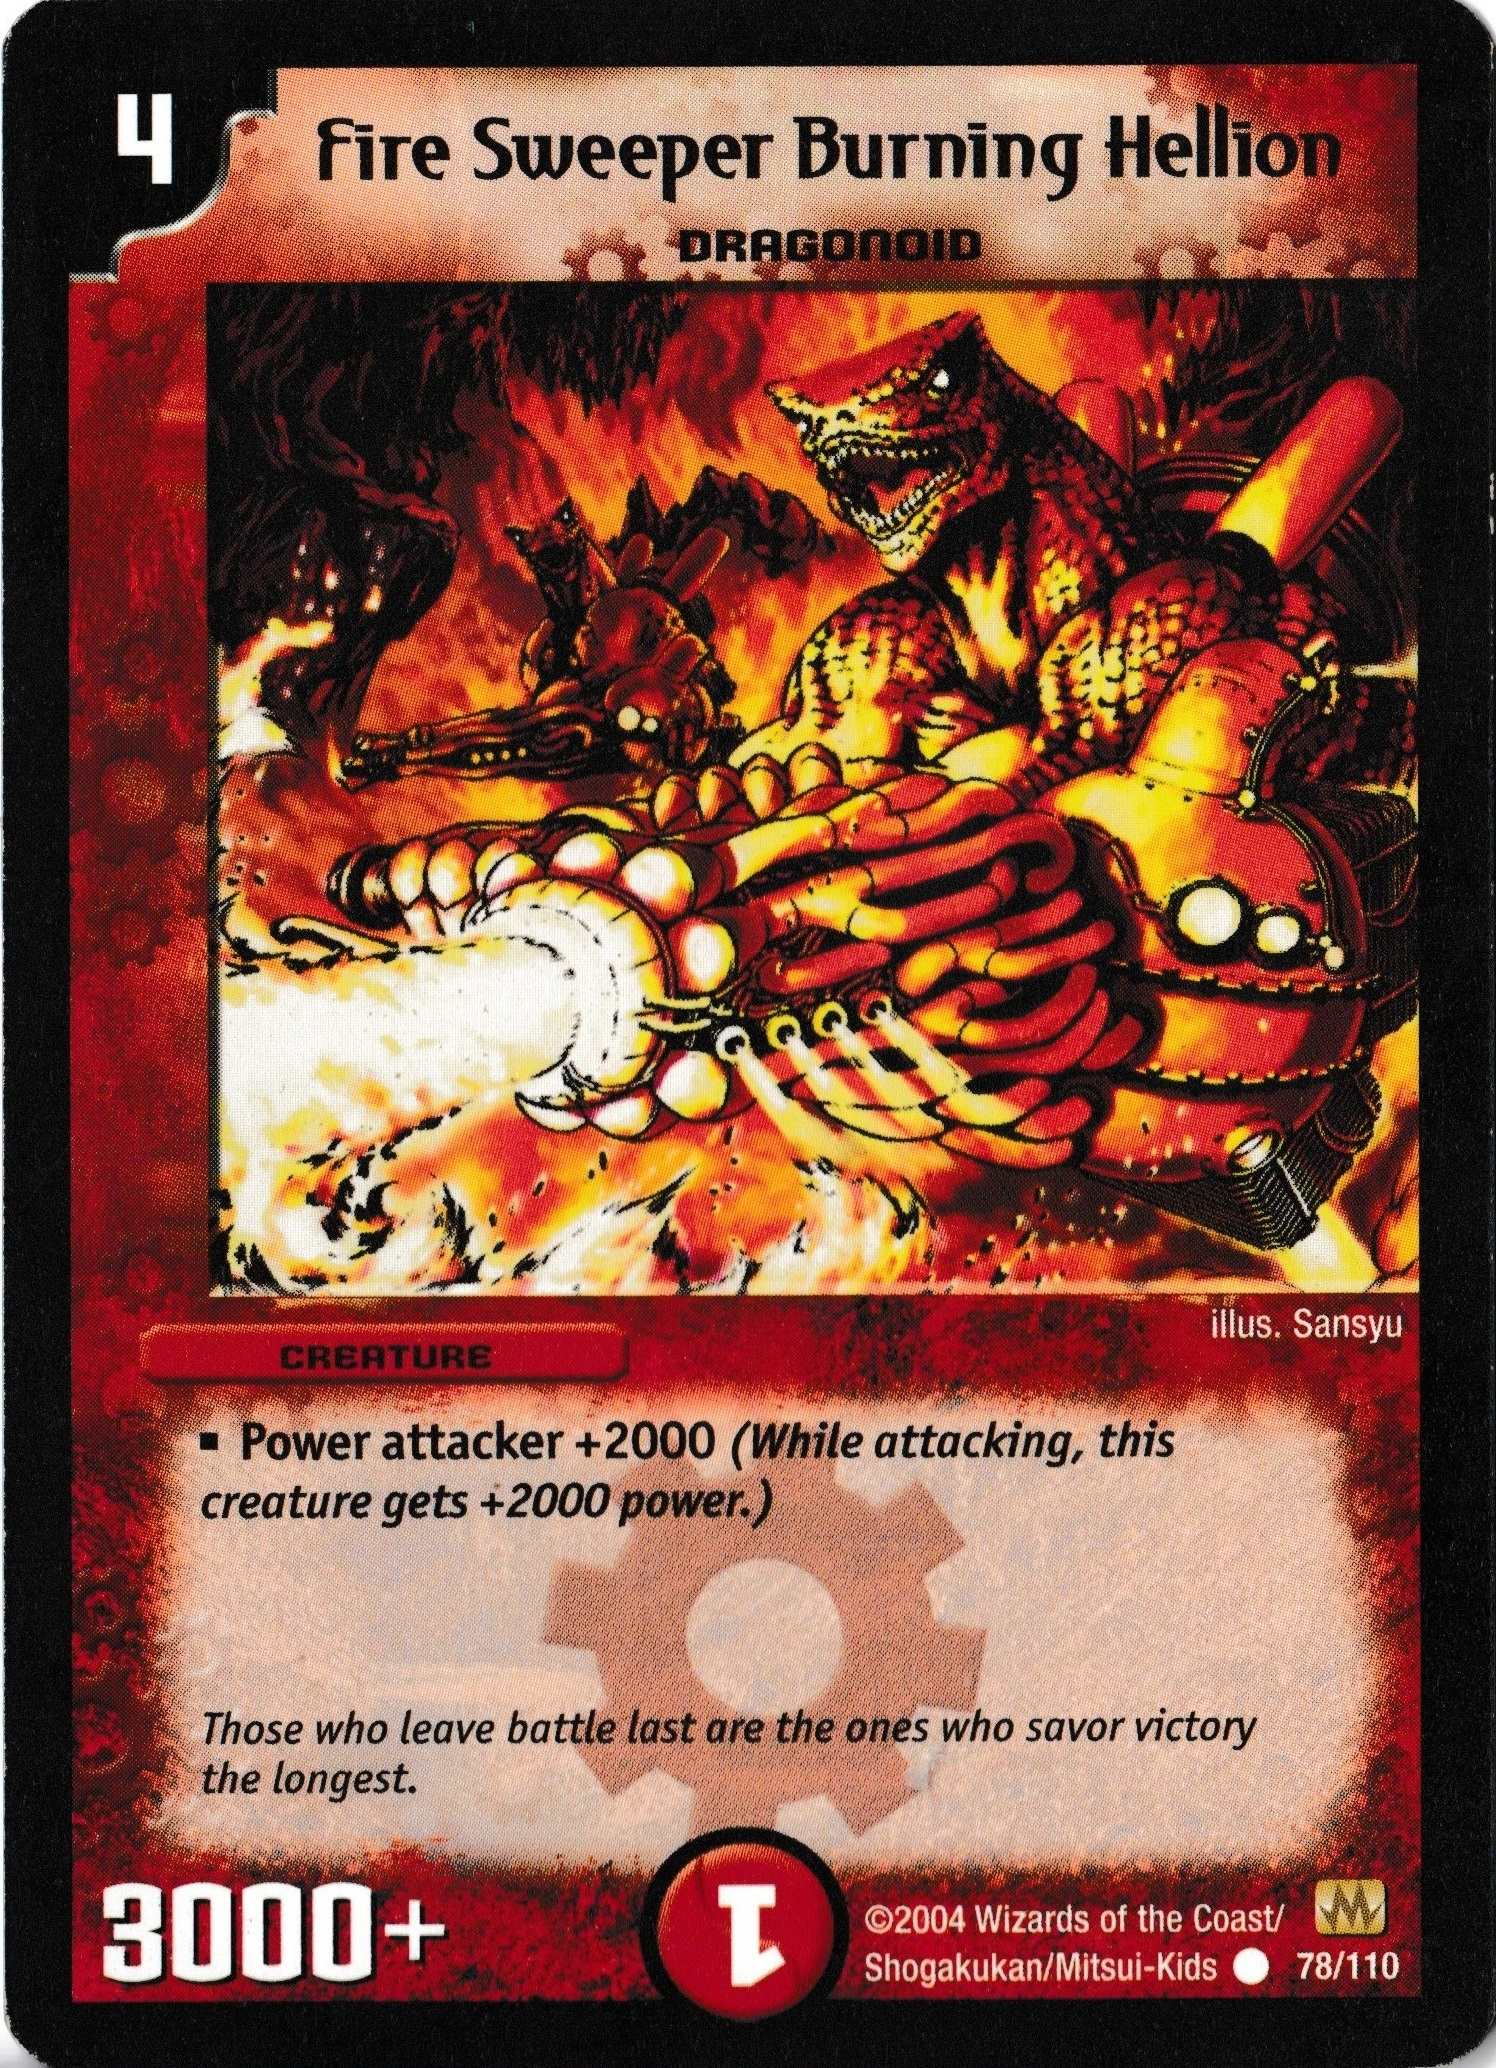 Fire Sweeper Burning Hellion